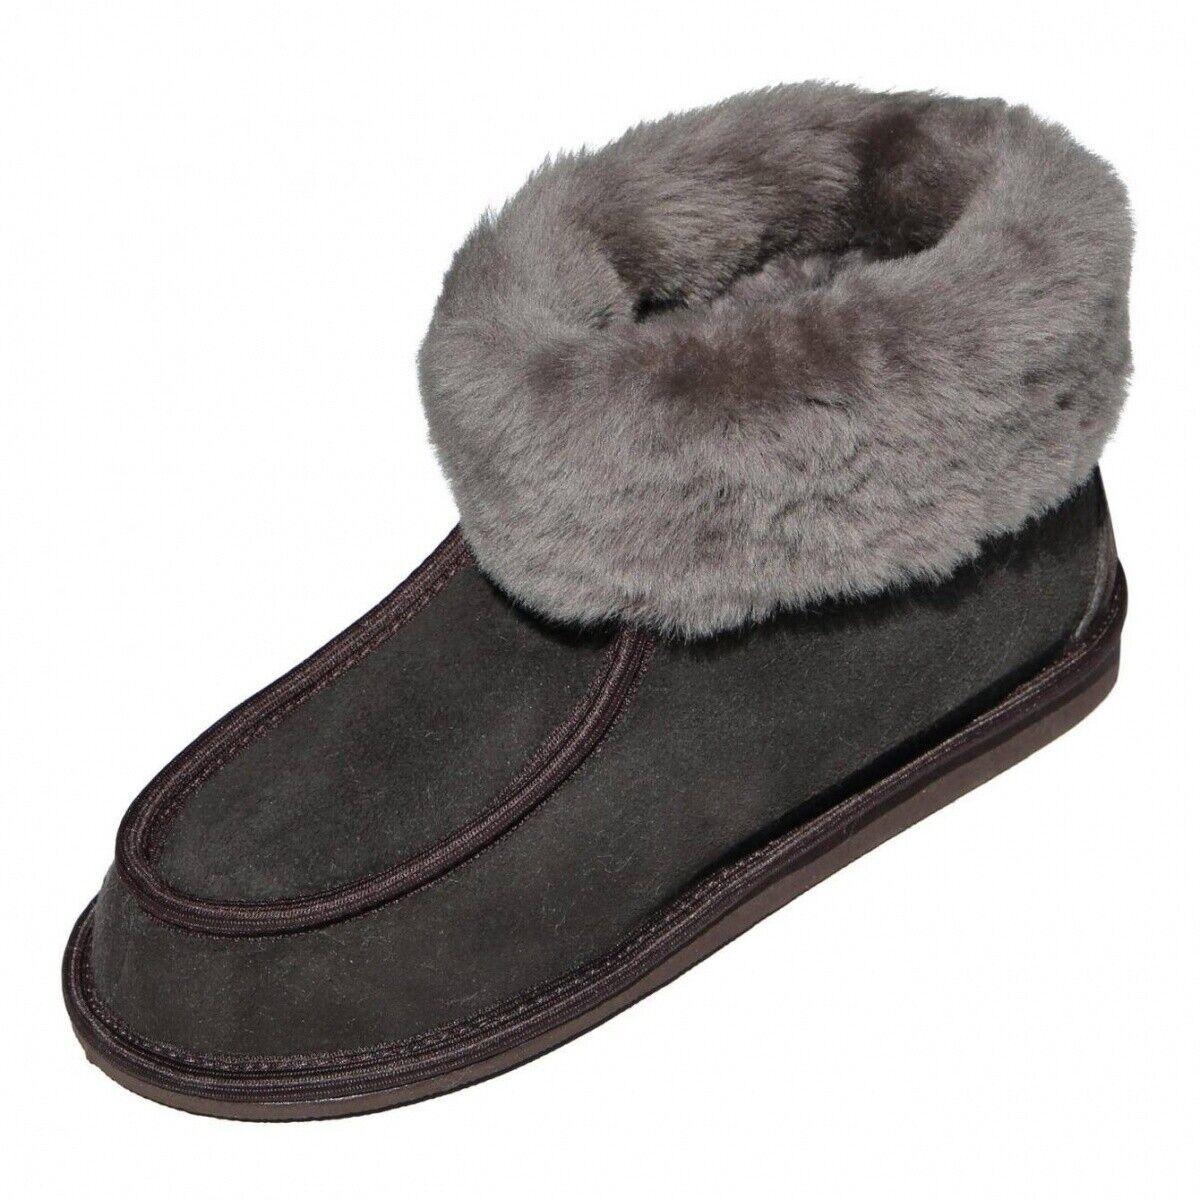 Lamb Wool House shoes - Adam Merino fur shoes Sheepskin Espresso